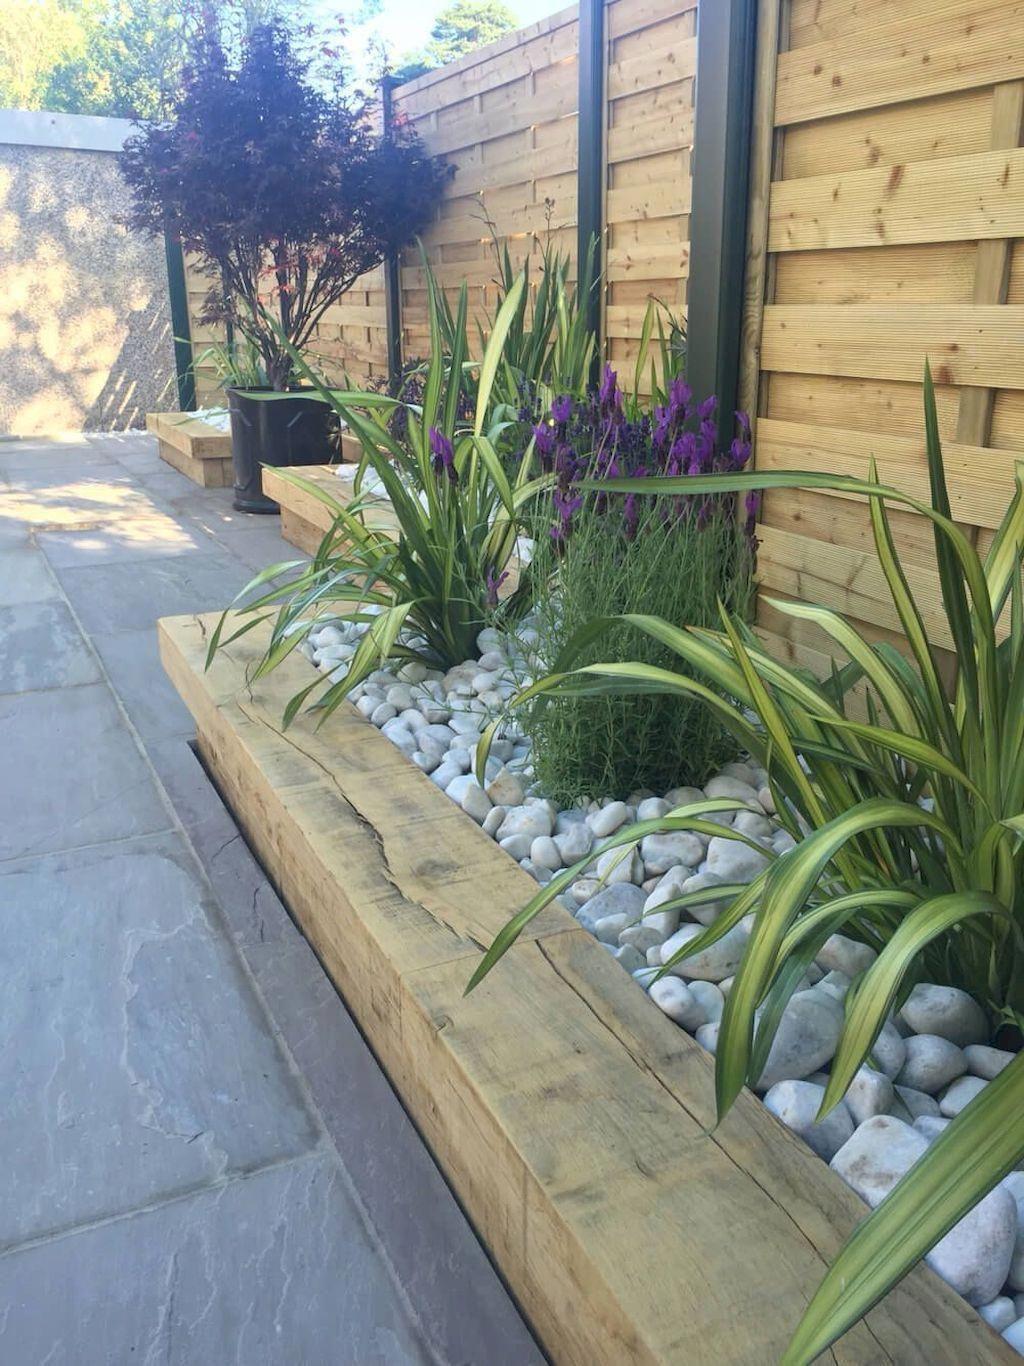 5338585785cc59d719c2235c69eb55c7 - Better Homes And Gardens Design Ideas